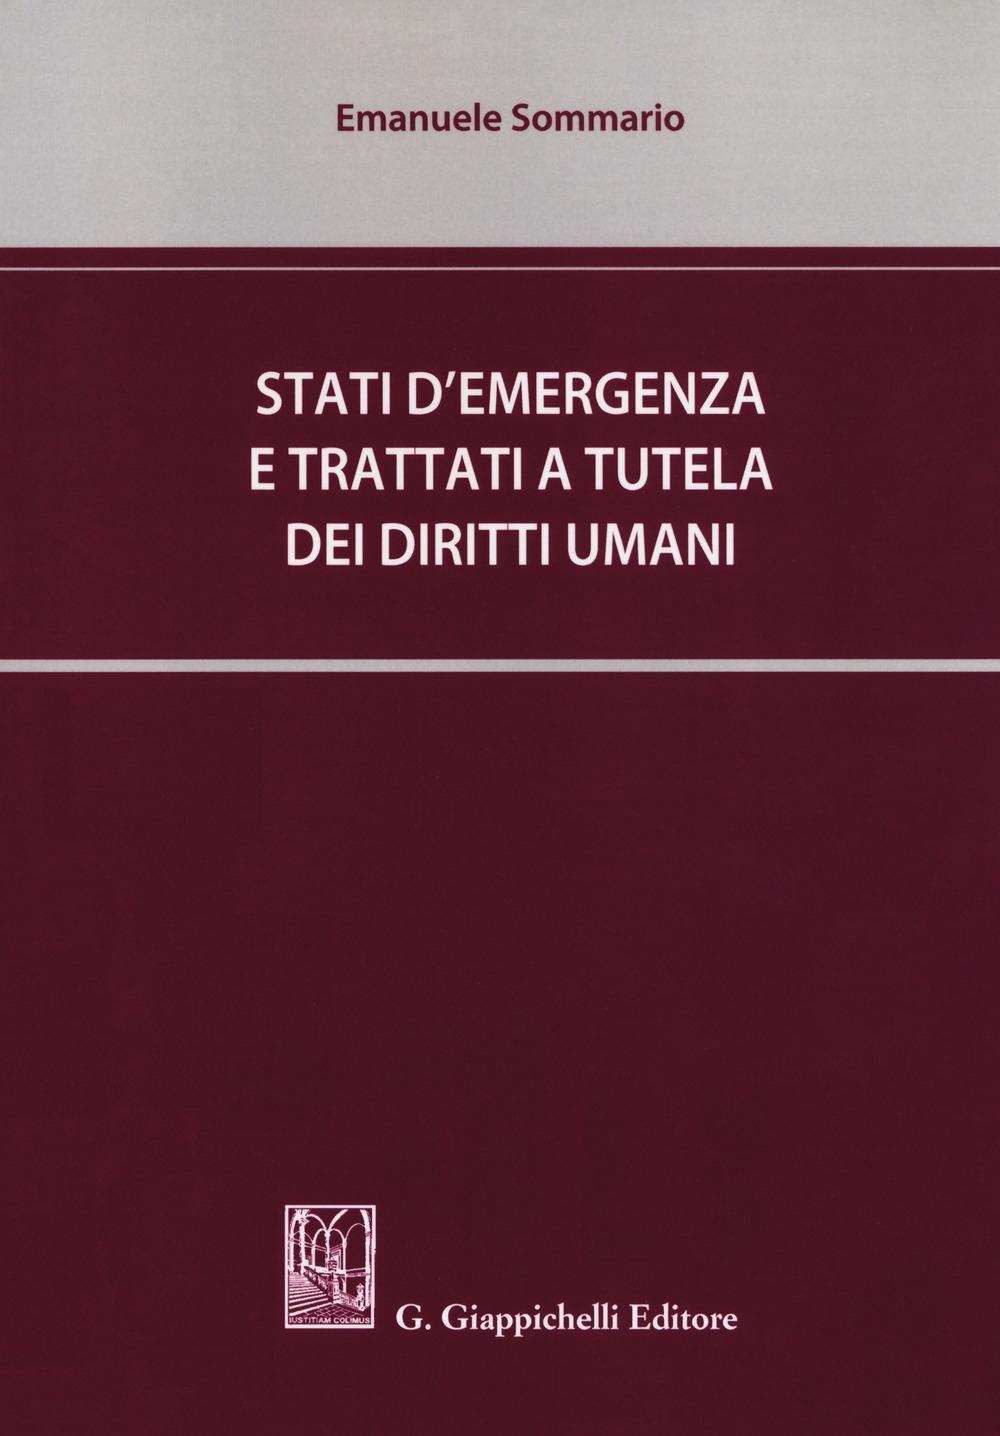 Stati d'emergenza e trattati a tutela dei diritti umani